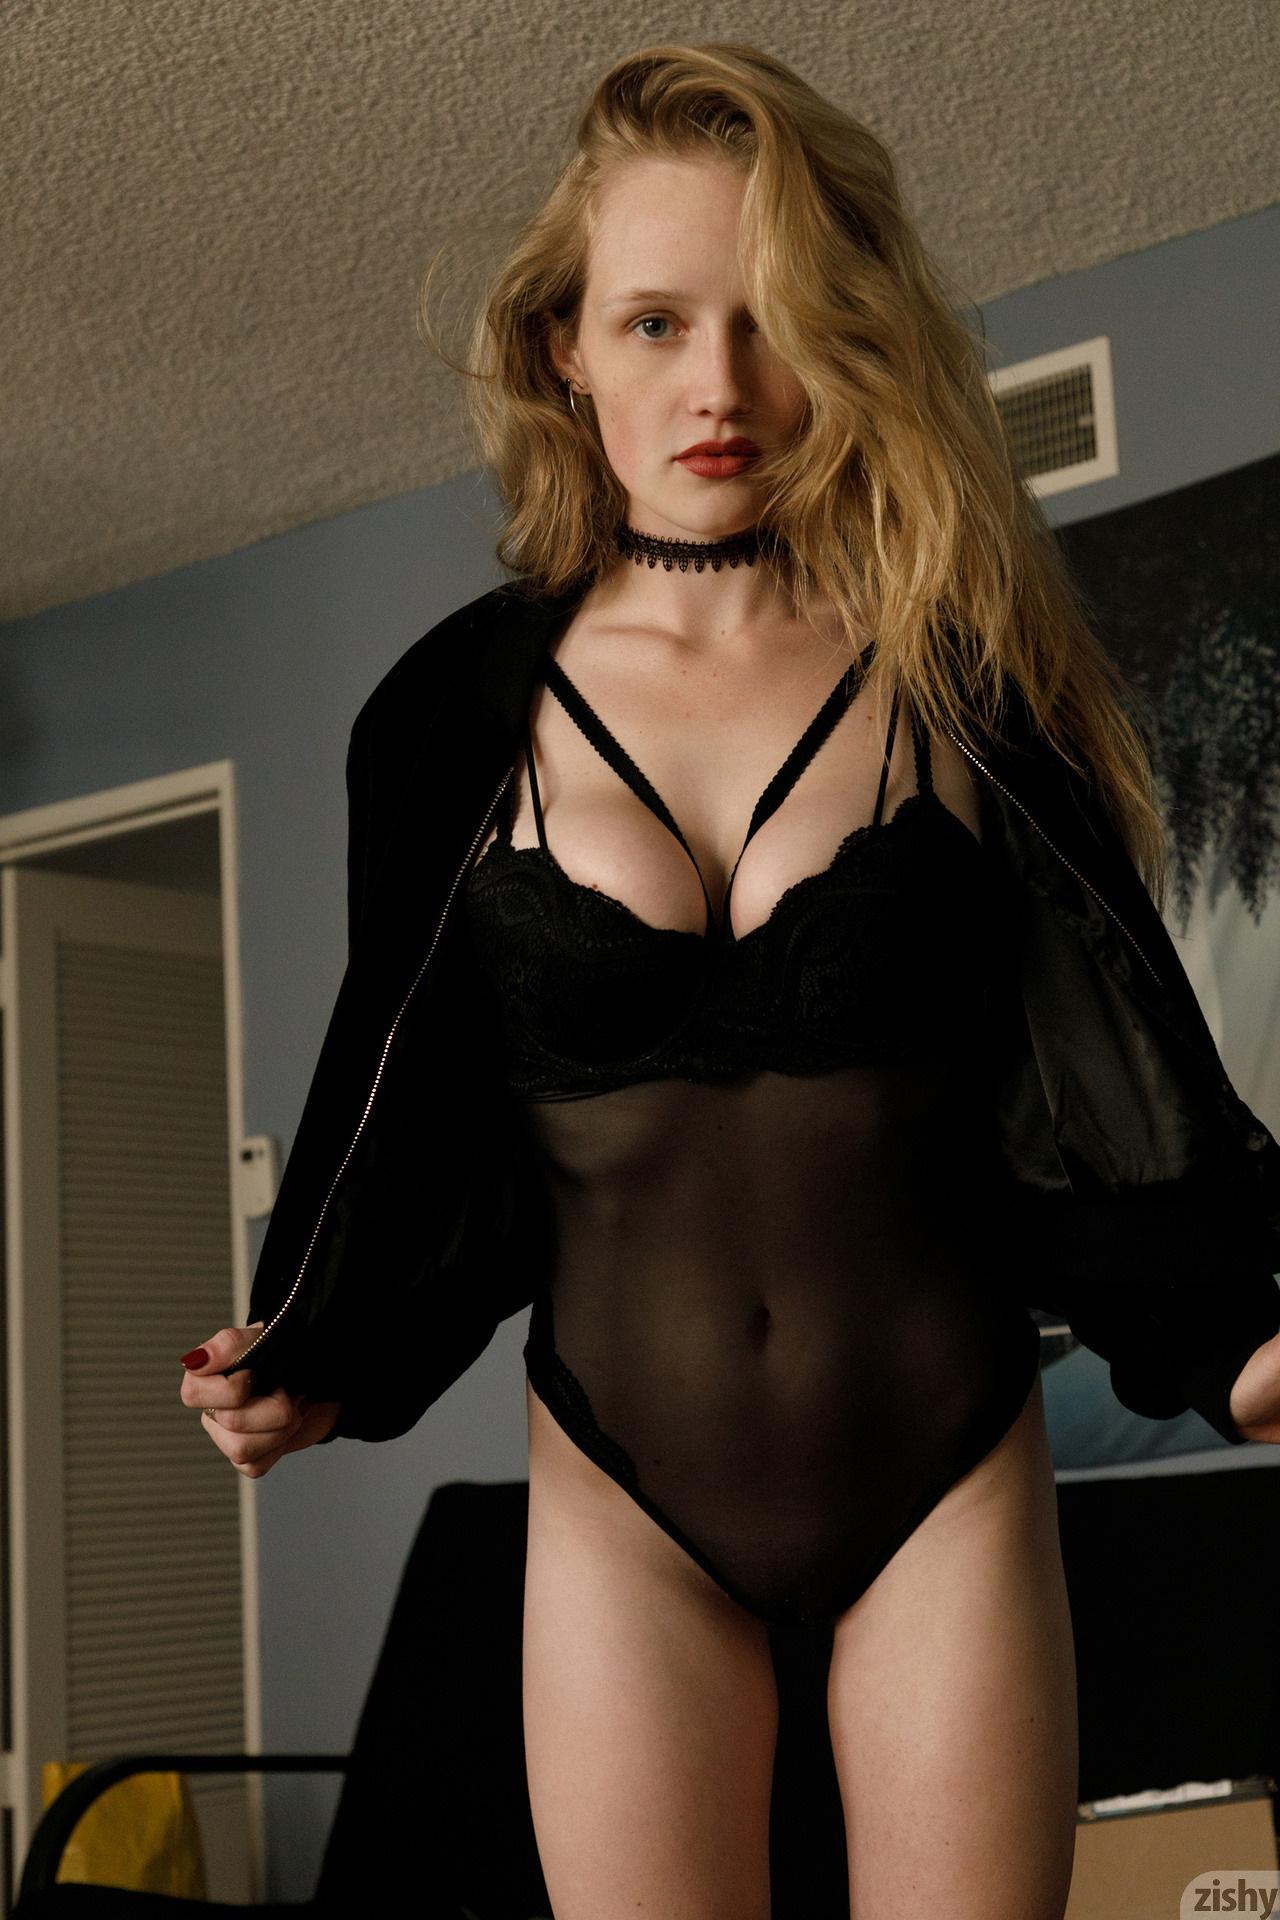 Giana Van Patten Black Coke Mirror Zishy (24)